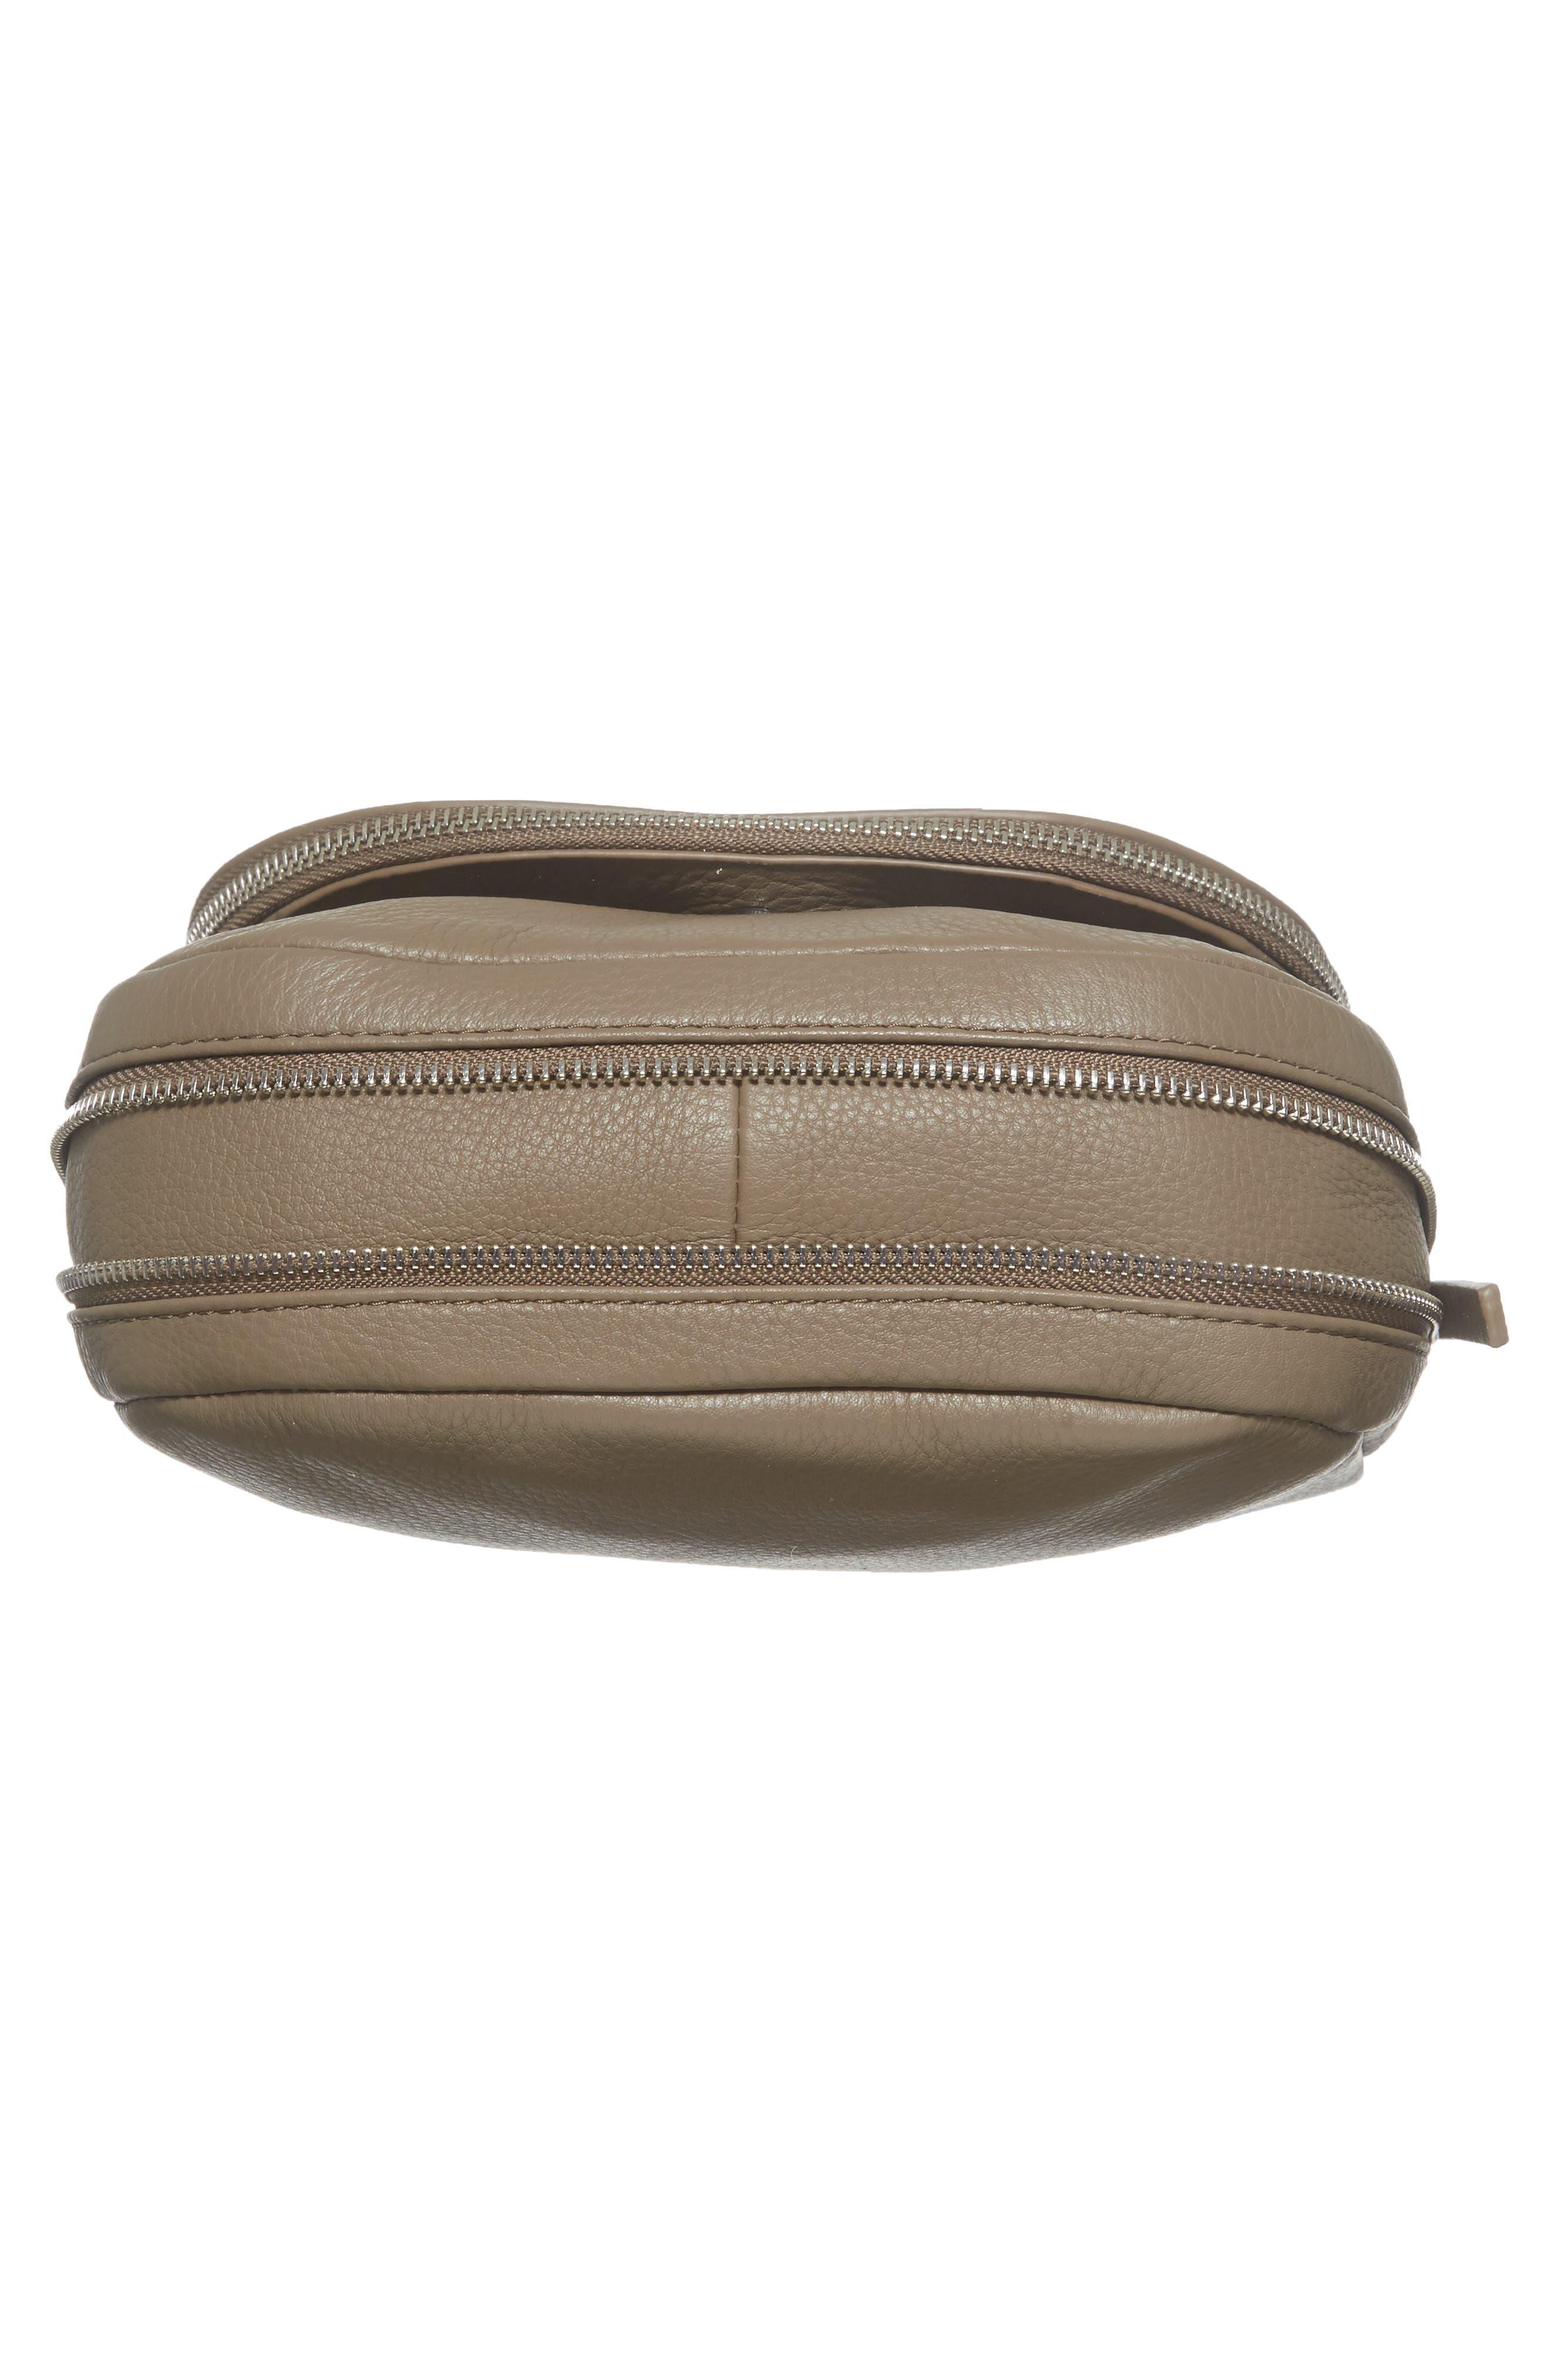 Bonny Studded Leather Crossbody Bag,                             Alternate thumbnail 12, color,